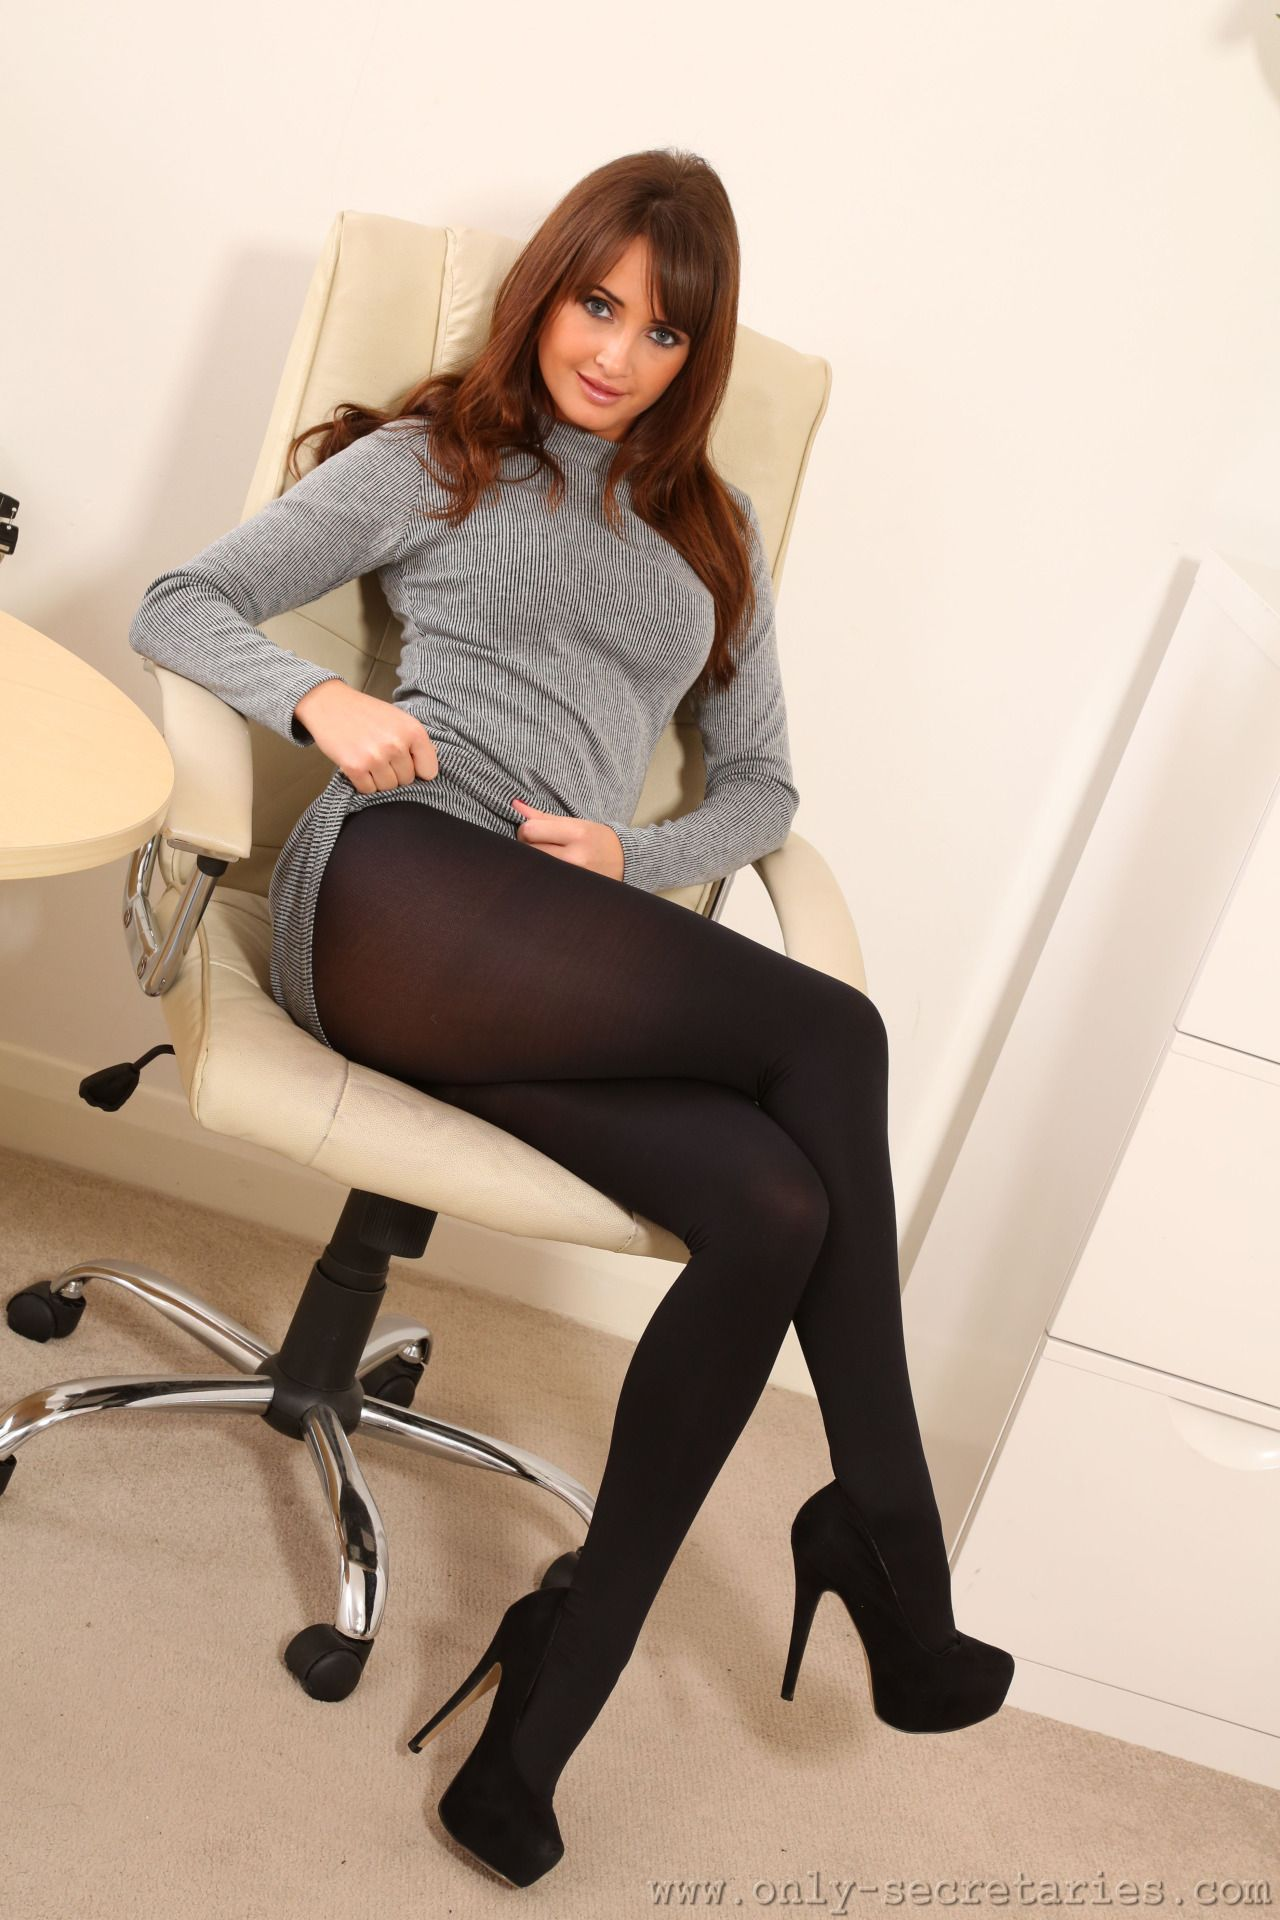 hot-opaque-pantyhose-girls-mature-amatuers-pics